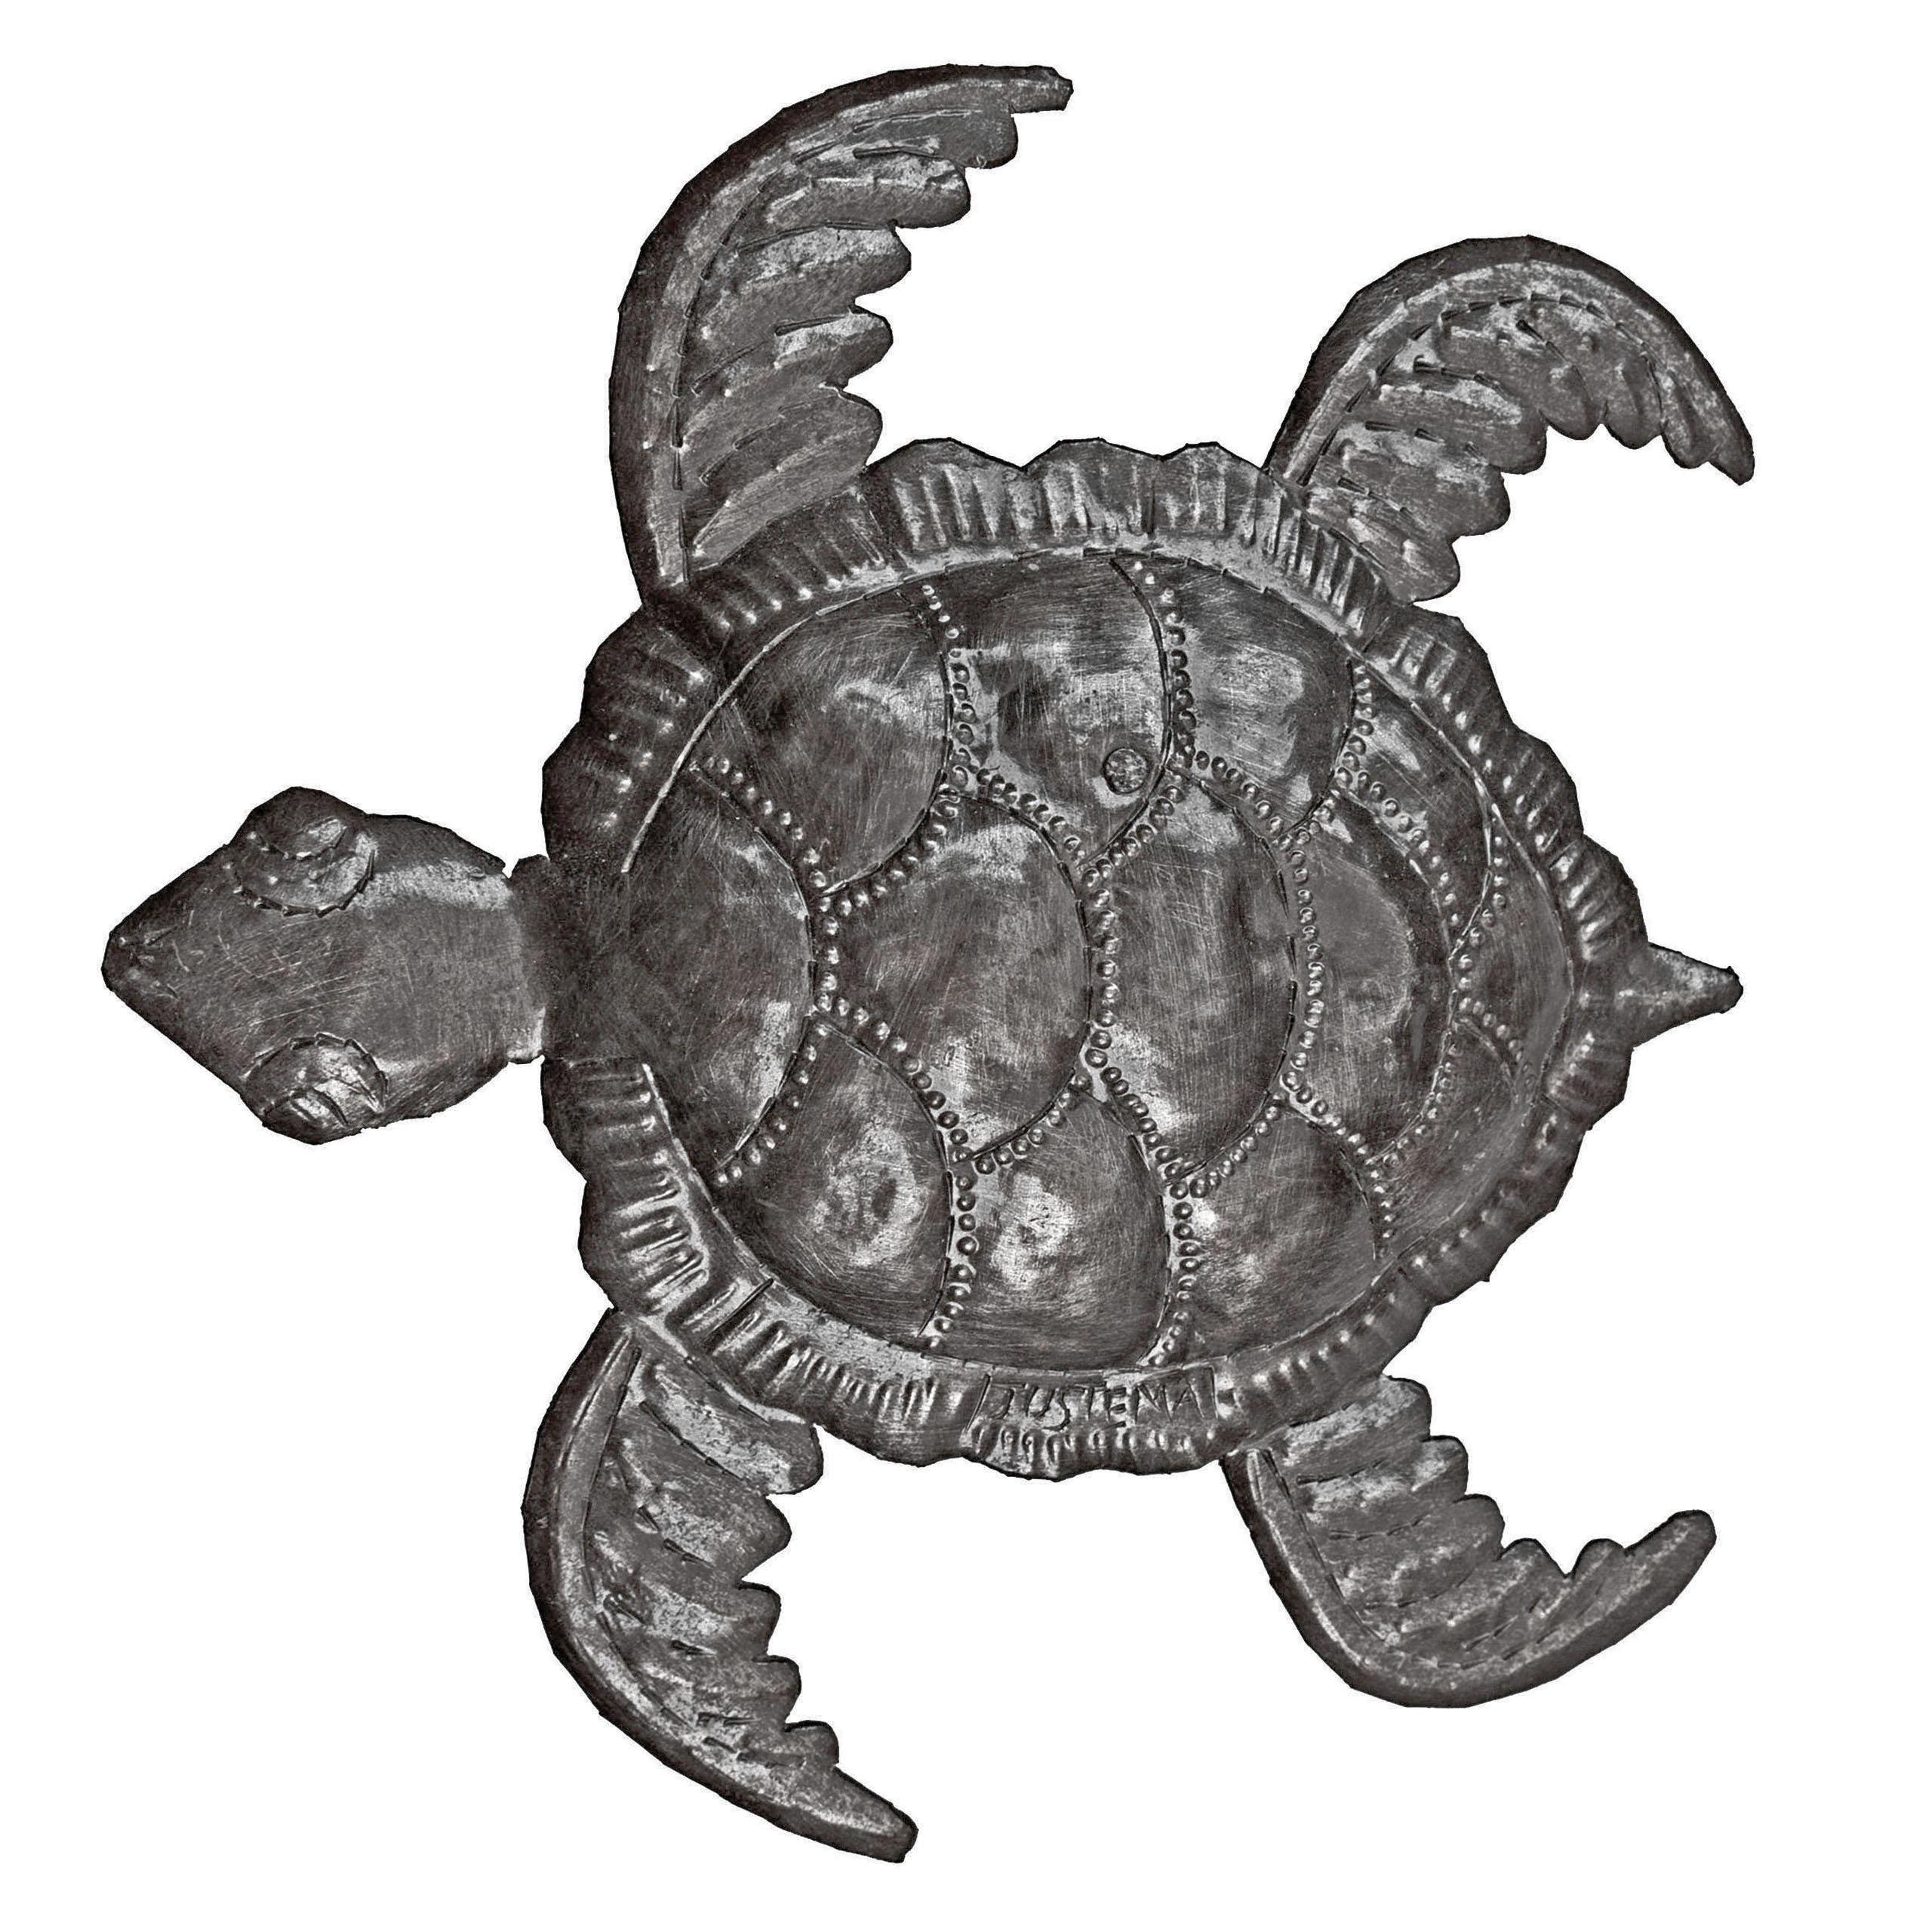 Sea Turtle Decor | Wayfair With Regard To Rhys Turtle Decor Wall Decor (View 8 of 30)